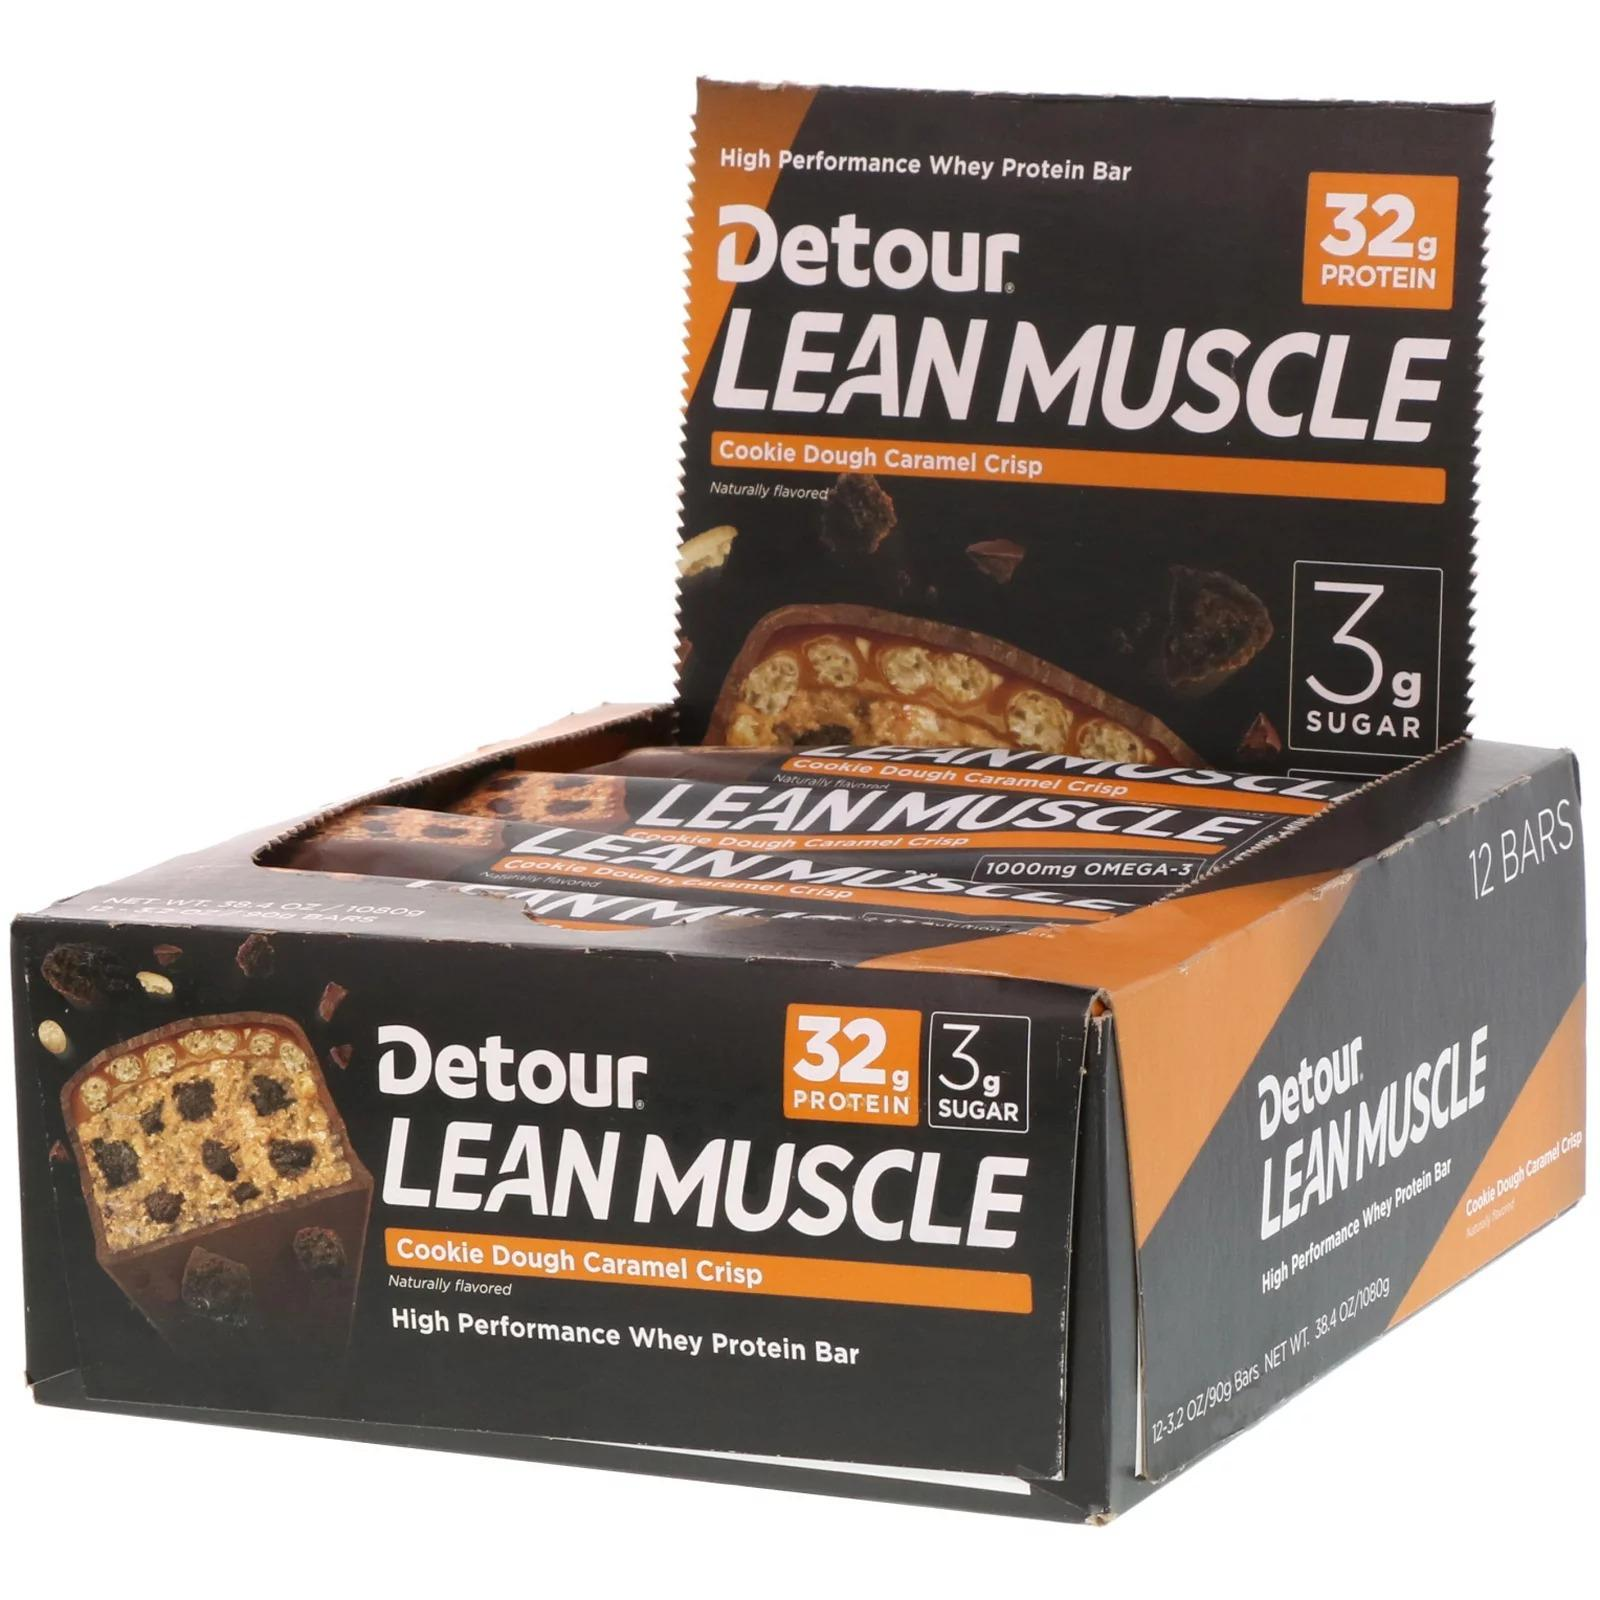 Protein Bar Detour Lean Muscle 12 bars x 90g : 32g Protein, 21 Vitamin,1000mg Omega-3